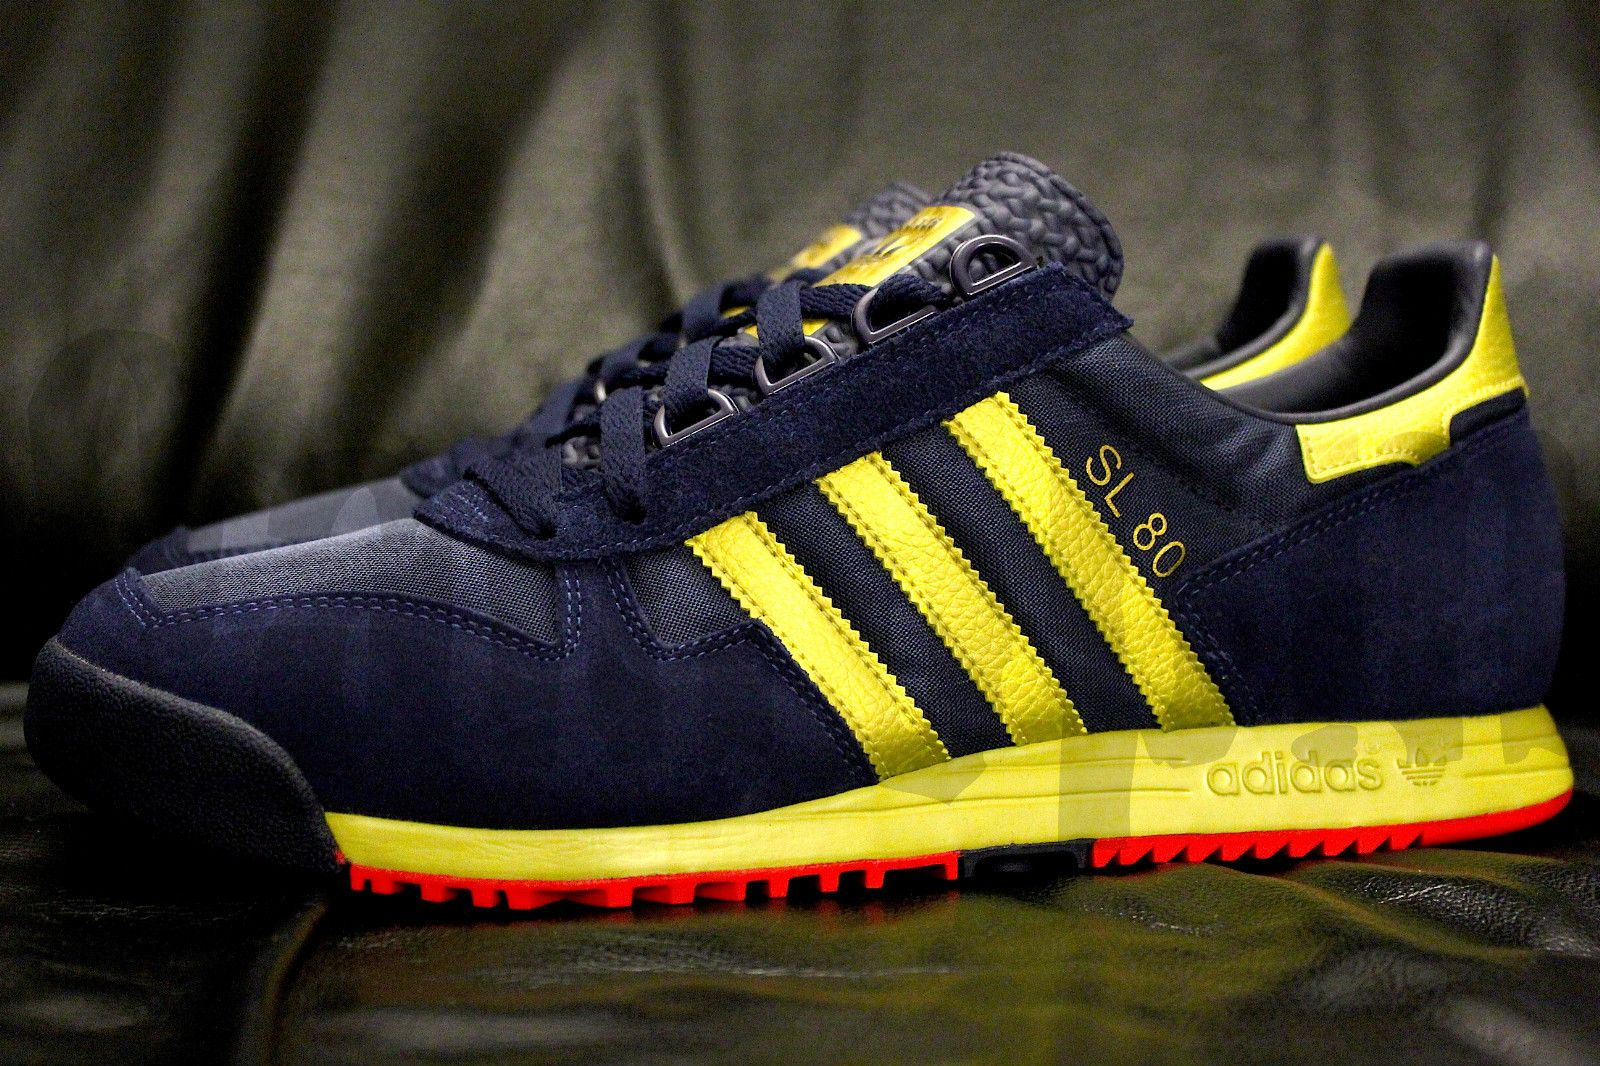 2010 Adidas SL 80 10 NAVY BLUE GOLD RED SUEDE sl80 milano 72